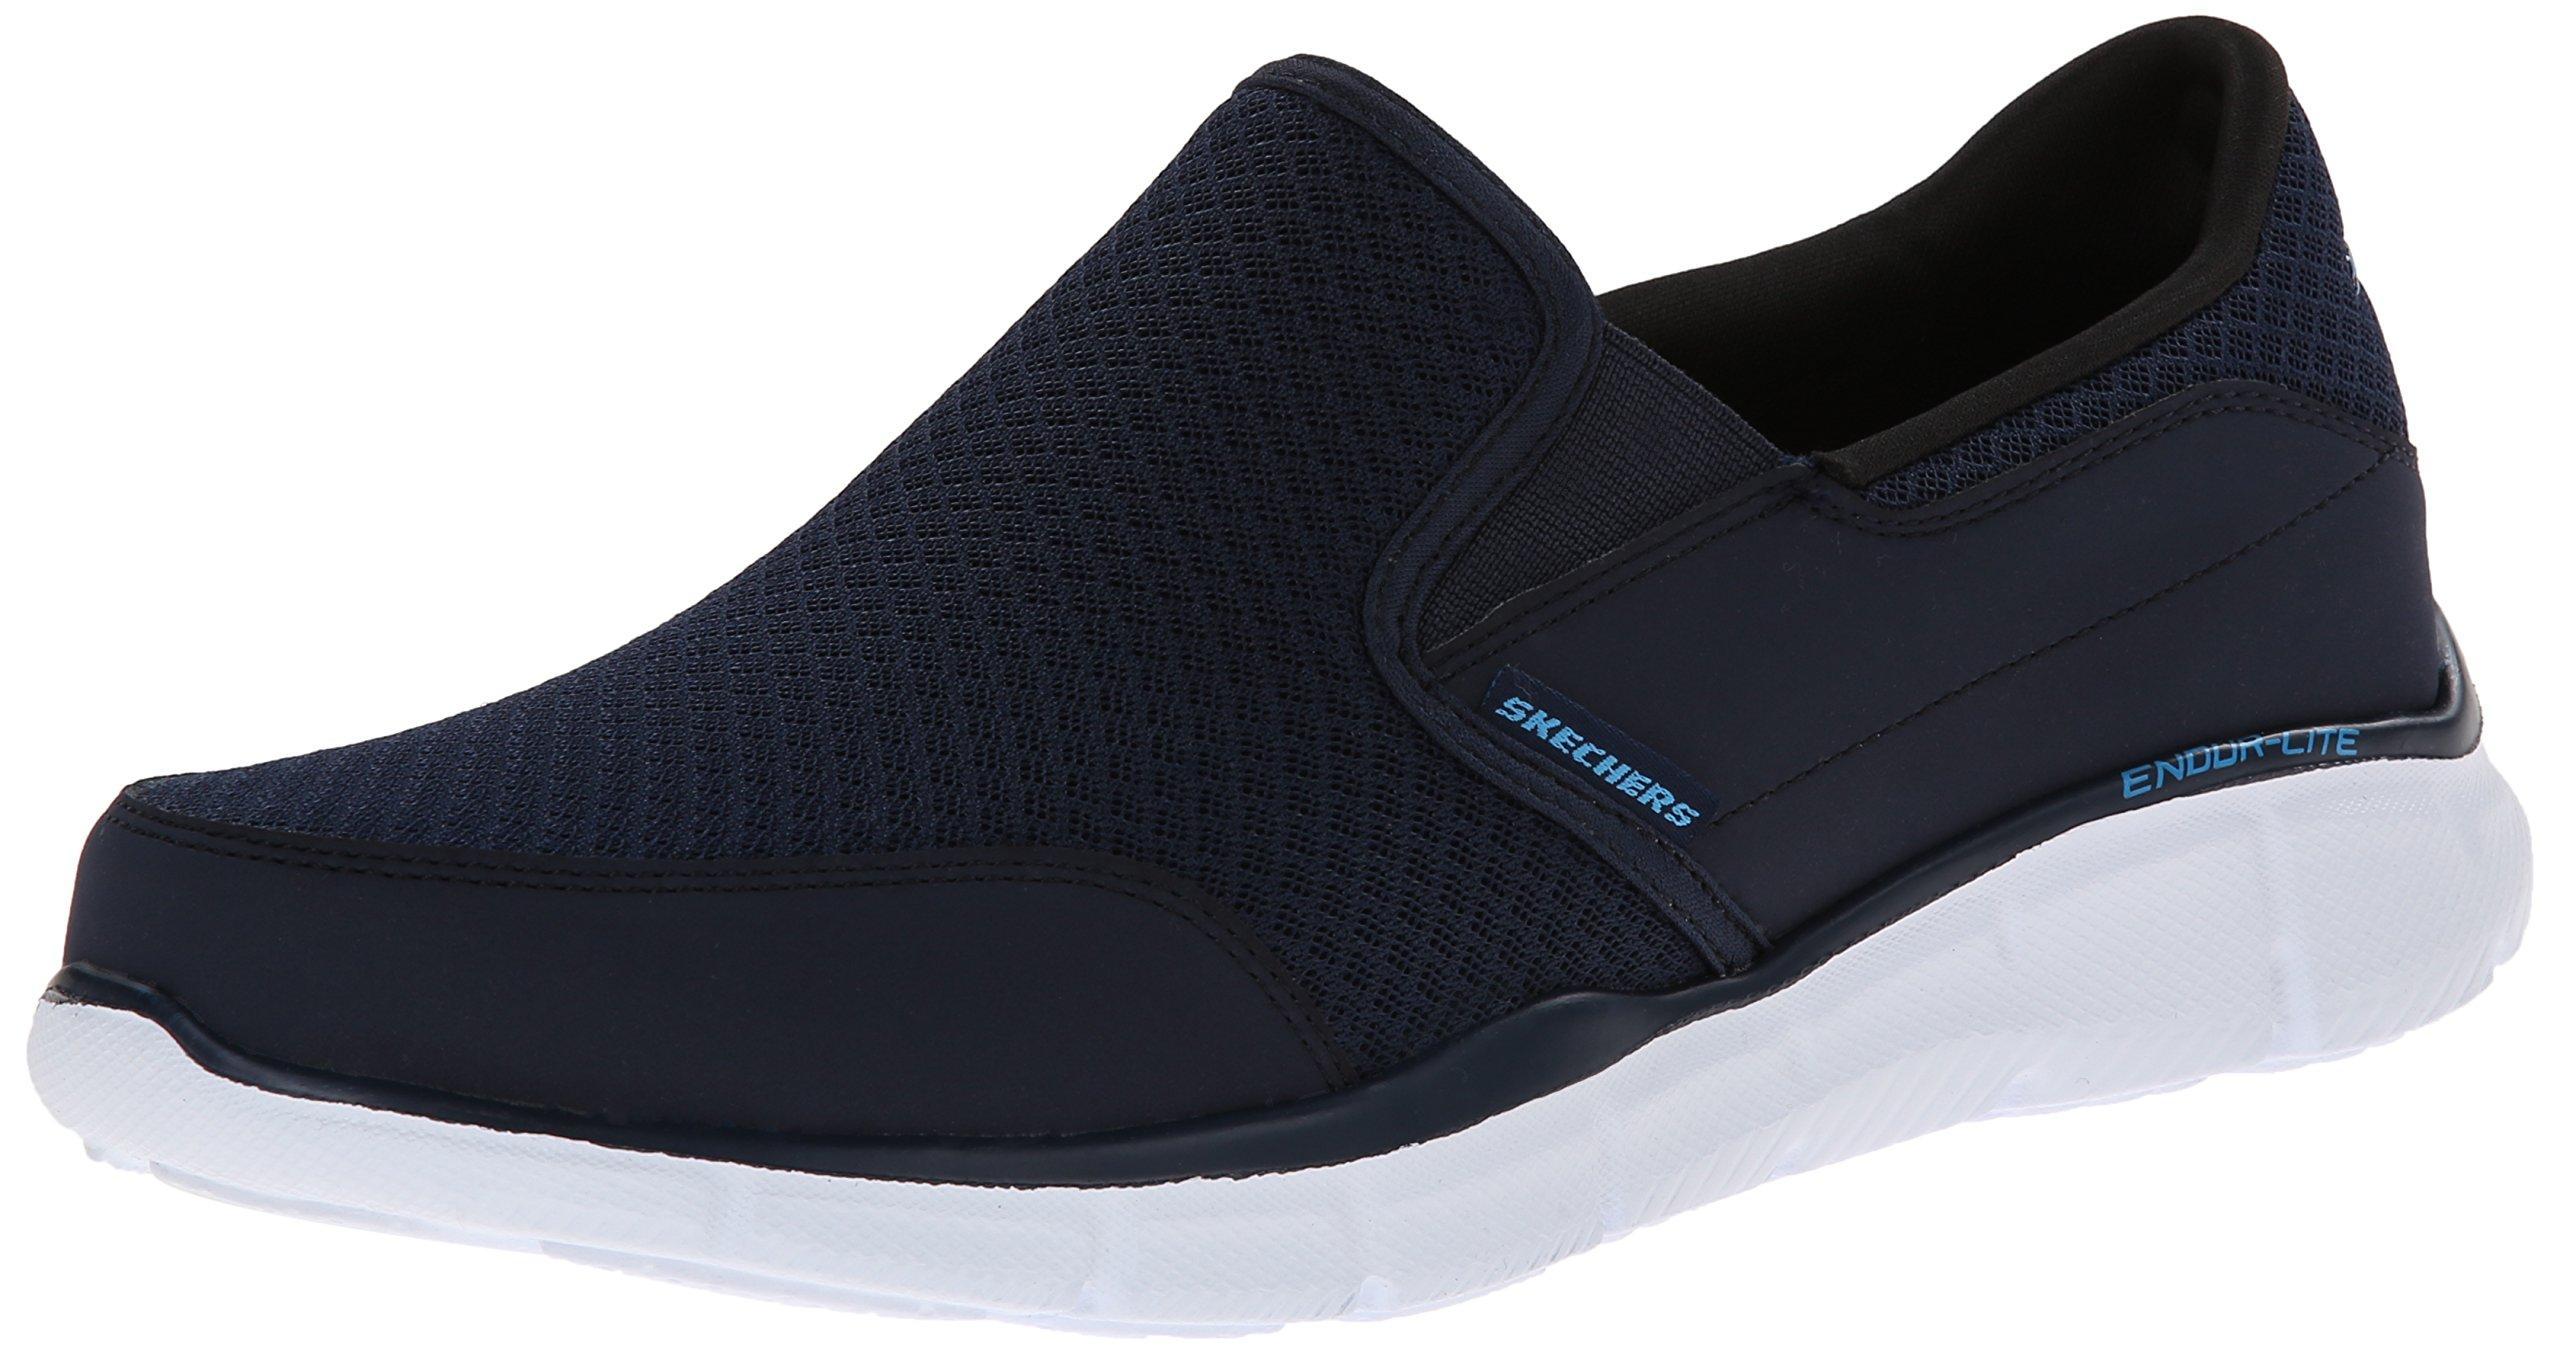 Skechers Men's Equalizer Persistent Slip-On Sneaker, Navy, 11.5 M US